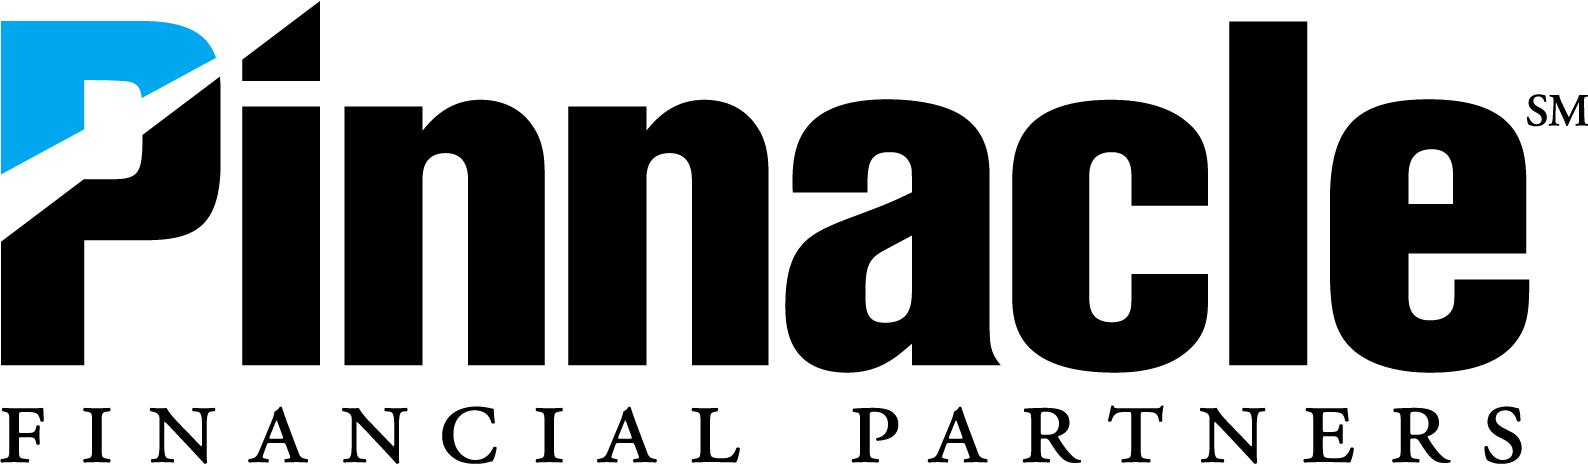 Pinnacle Financial Partners